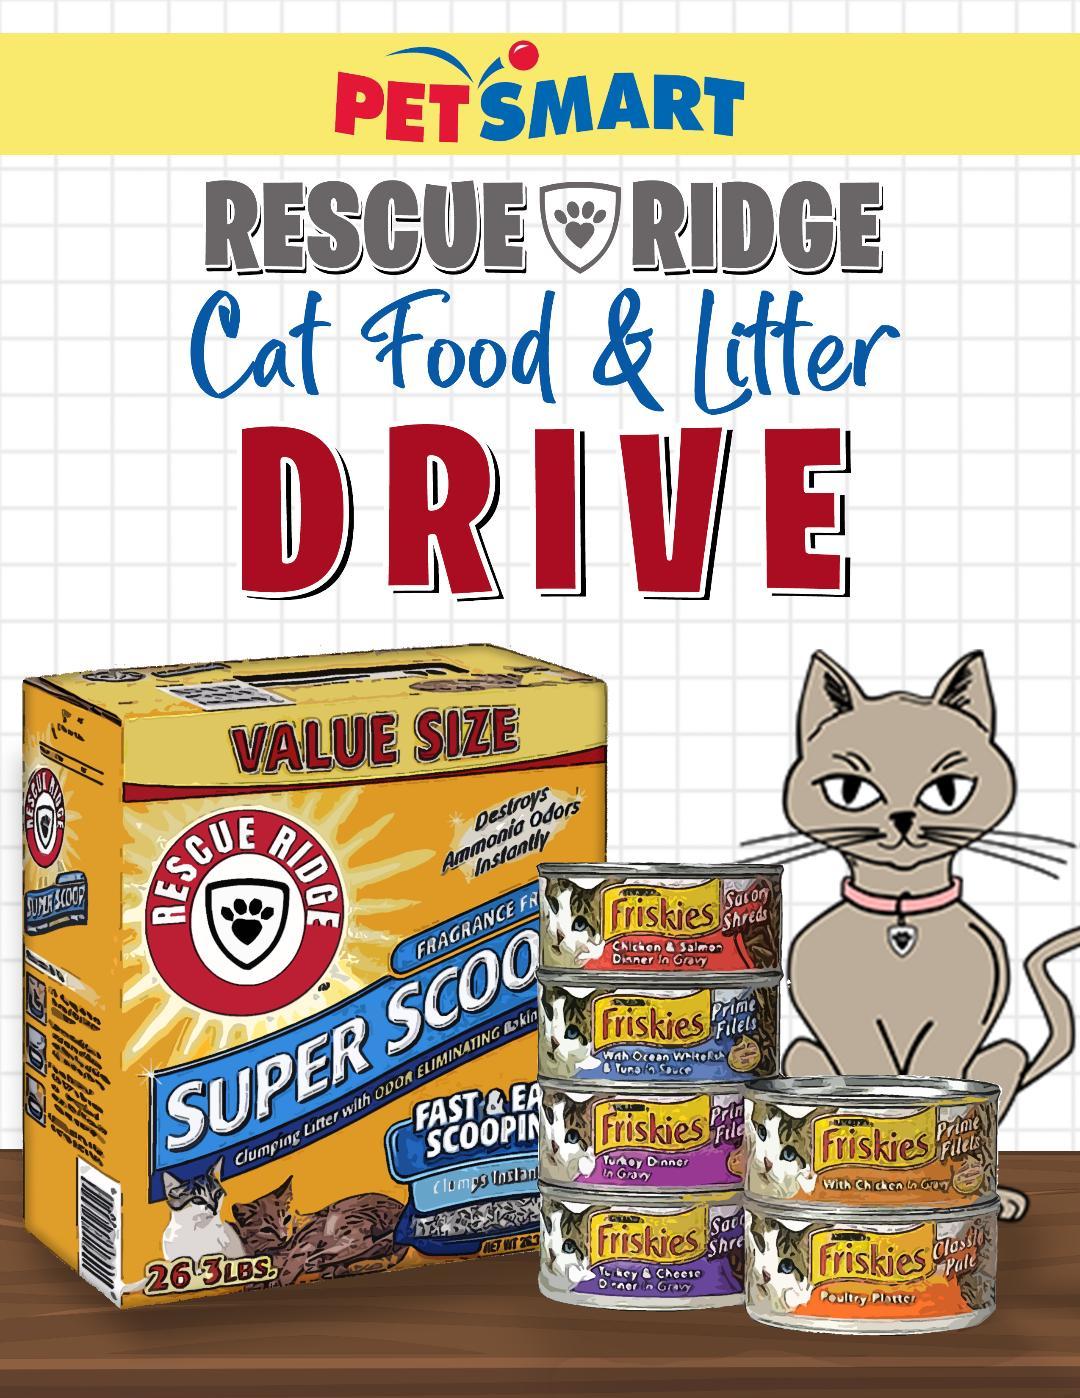 cat-food-and-litter-drive-for-petsmart-rescue-ridge-dec-9-2020.jpg